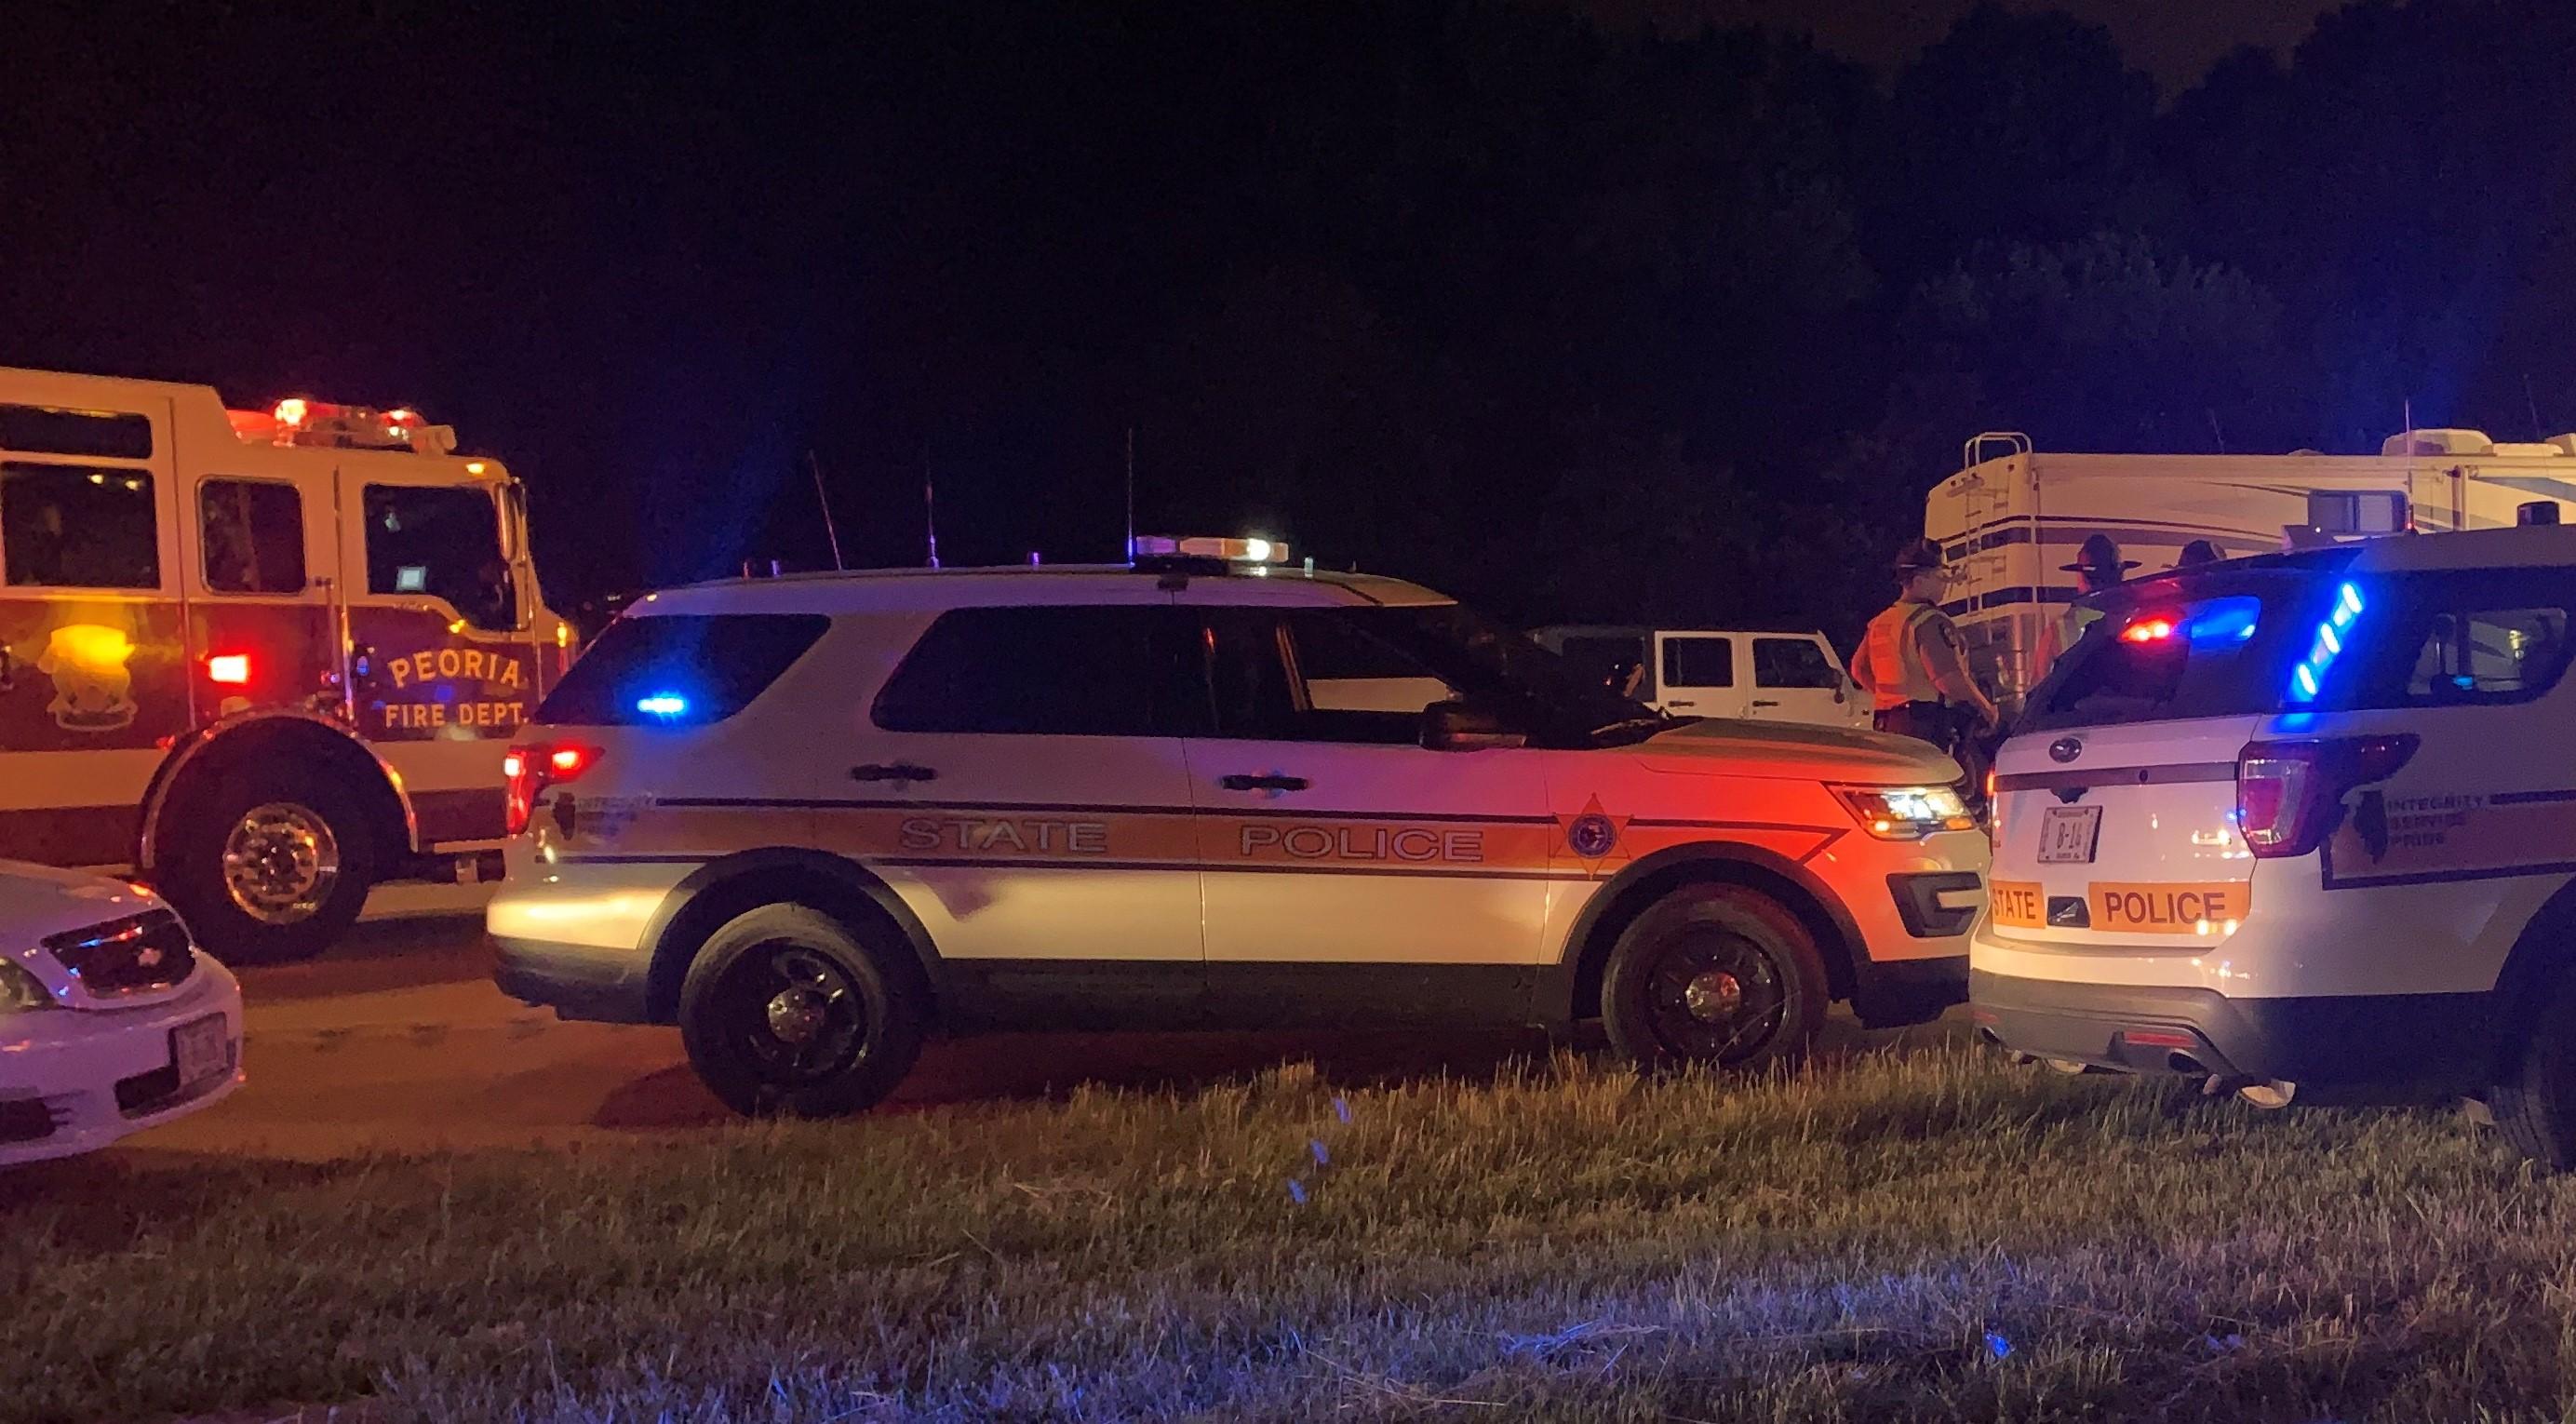 Police identify victim in Saturday night fatal car crash